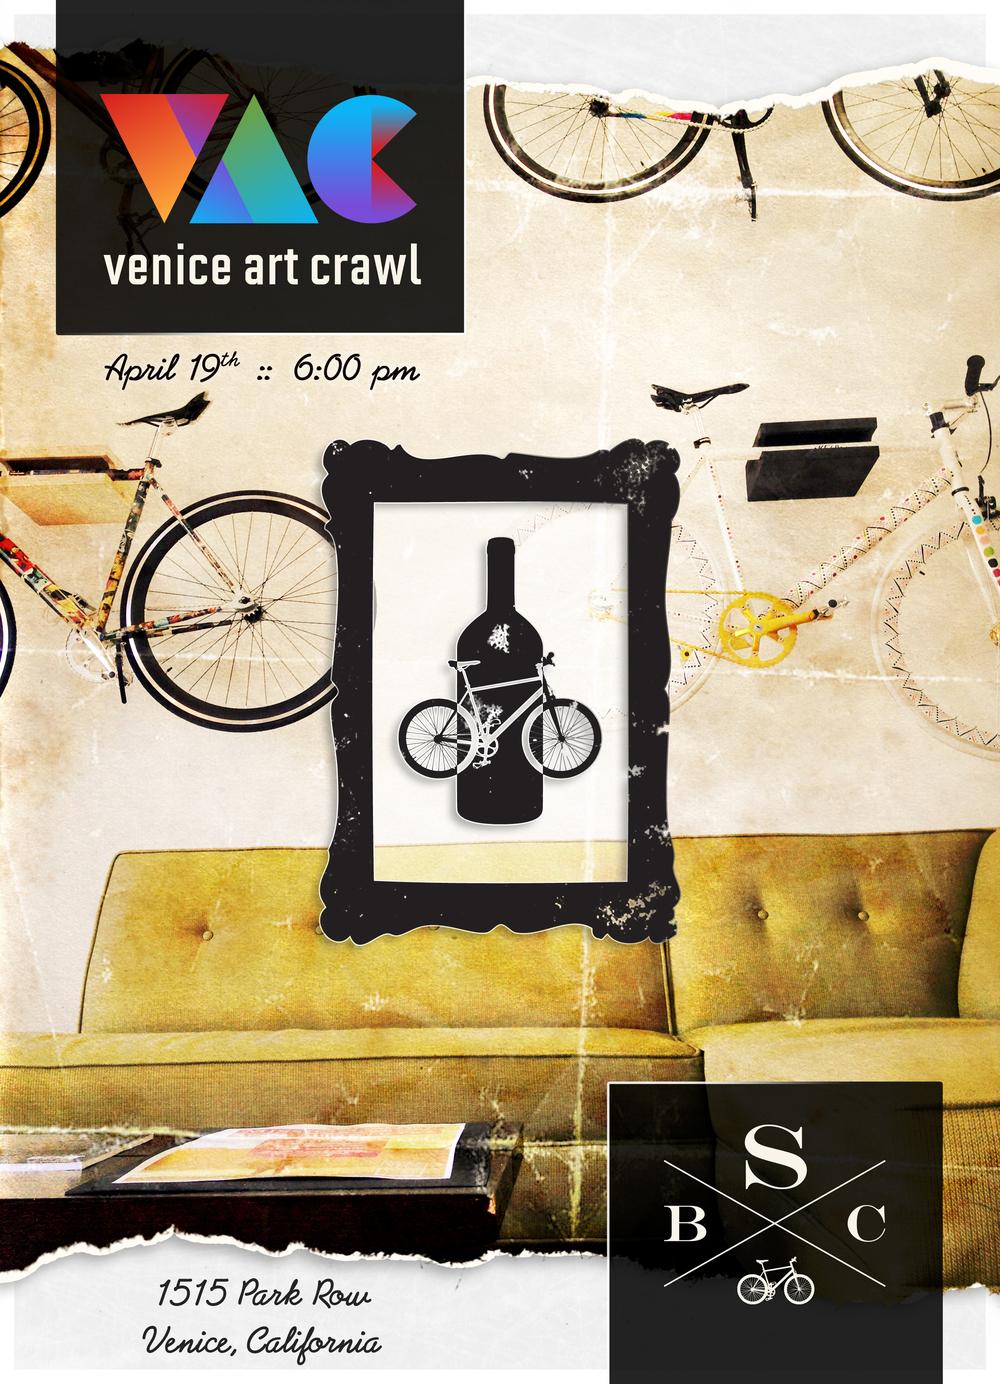 veniceartcrawl_poster2.jpg